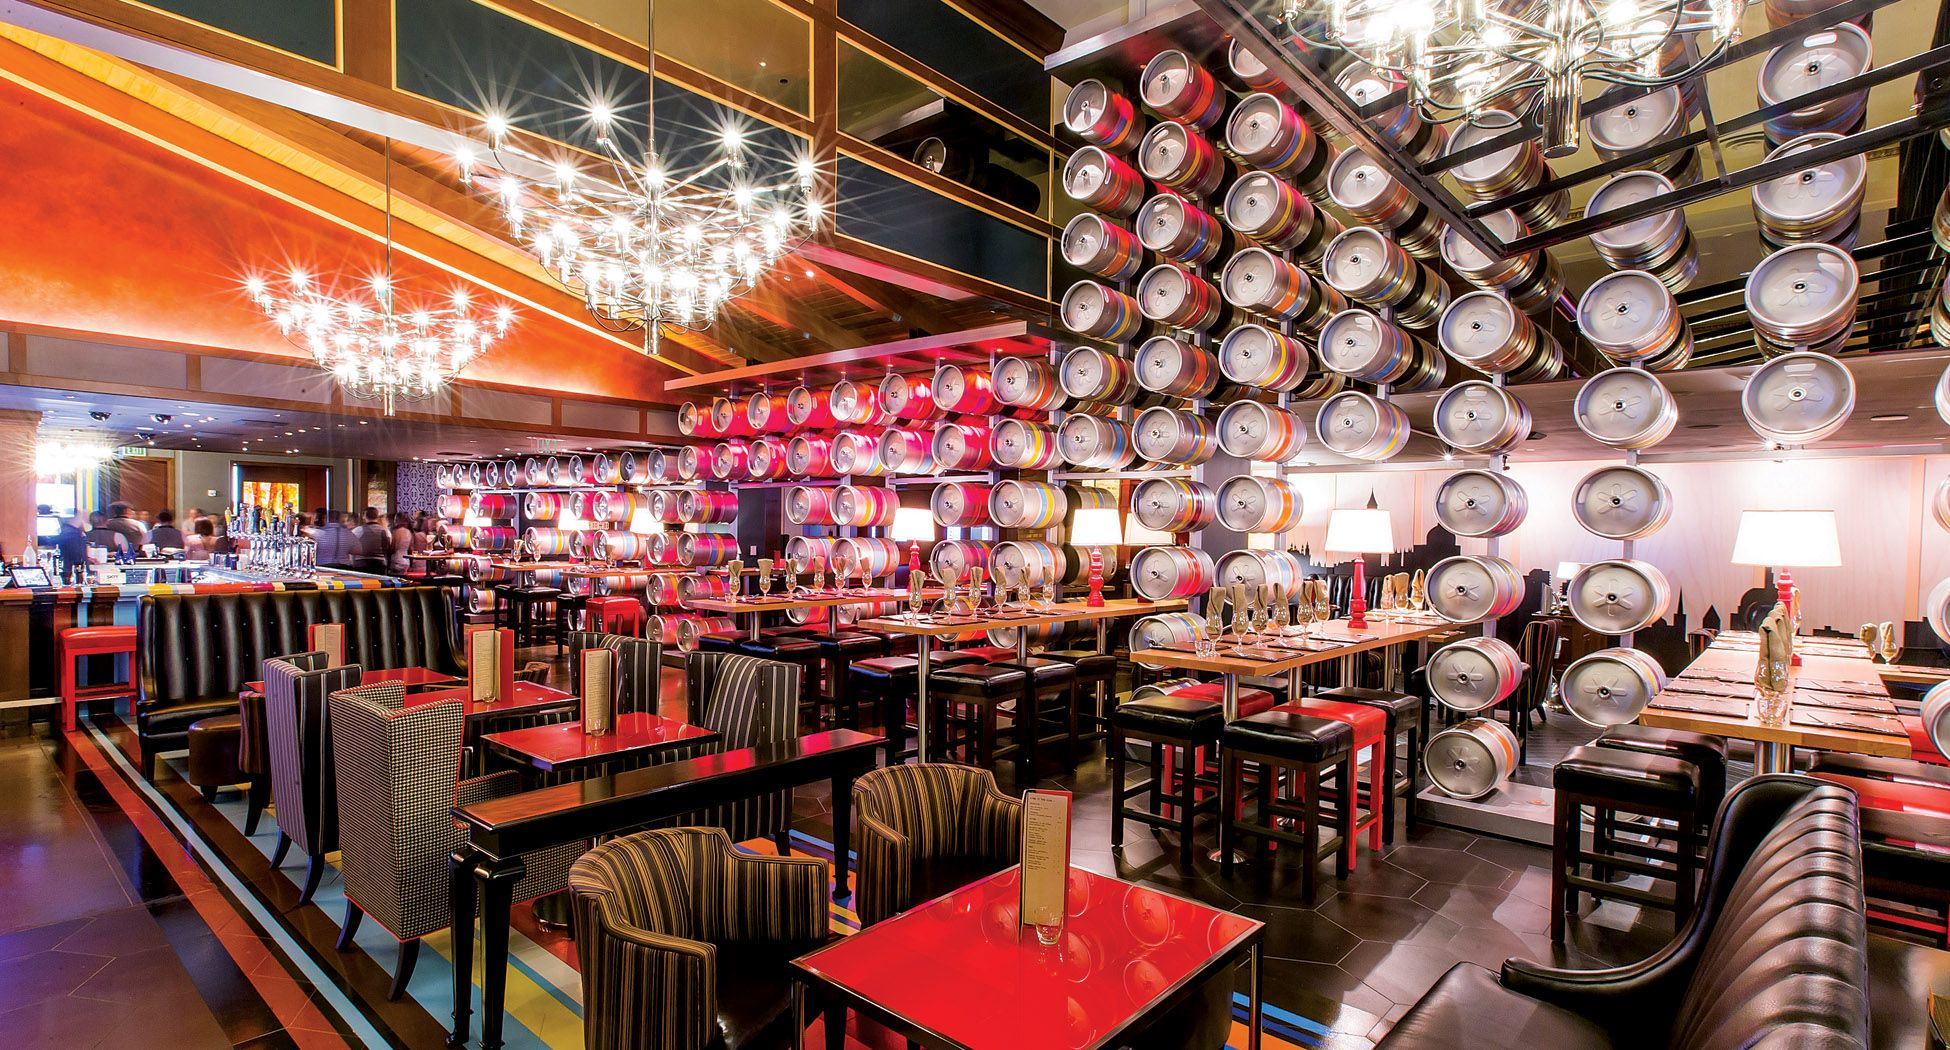 Best Restaurant Design  Gordon Ramsay Pub  Grill at